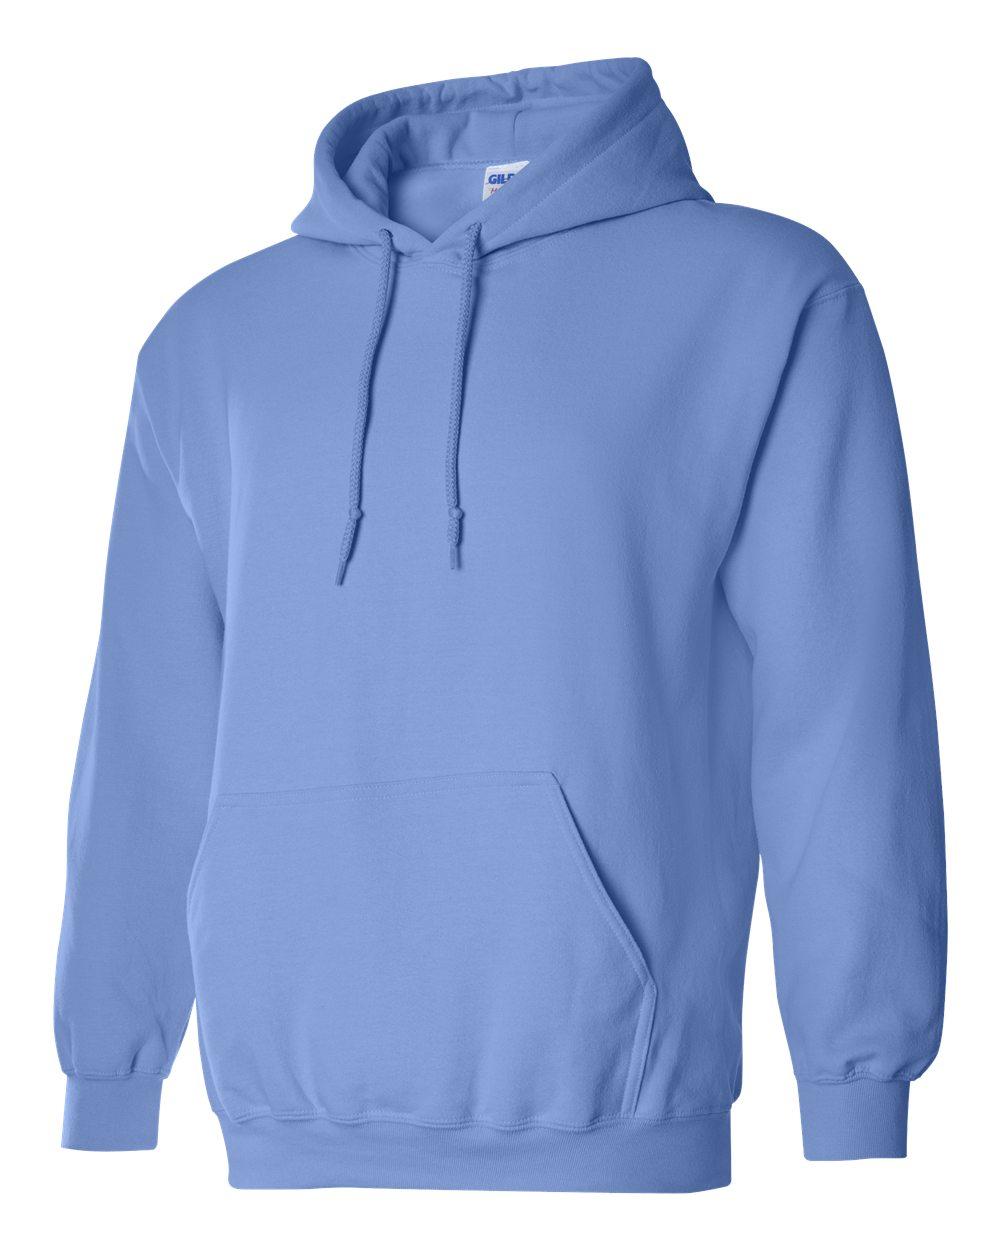 Gildan Heavy Blend Hooded Sweatshirt GI18500 Carolina Blue